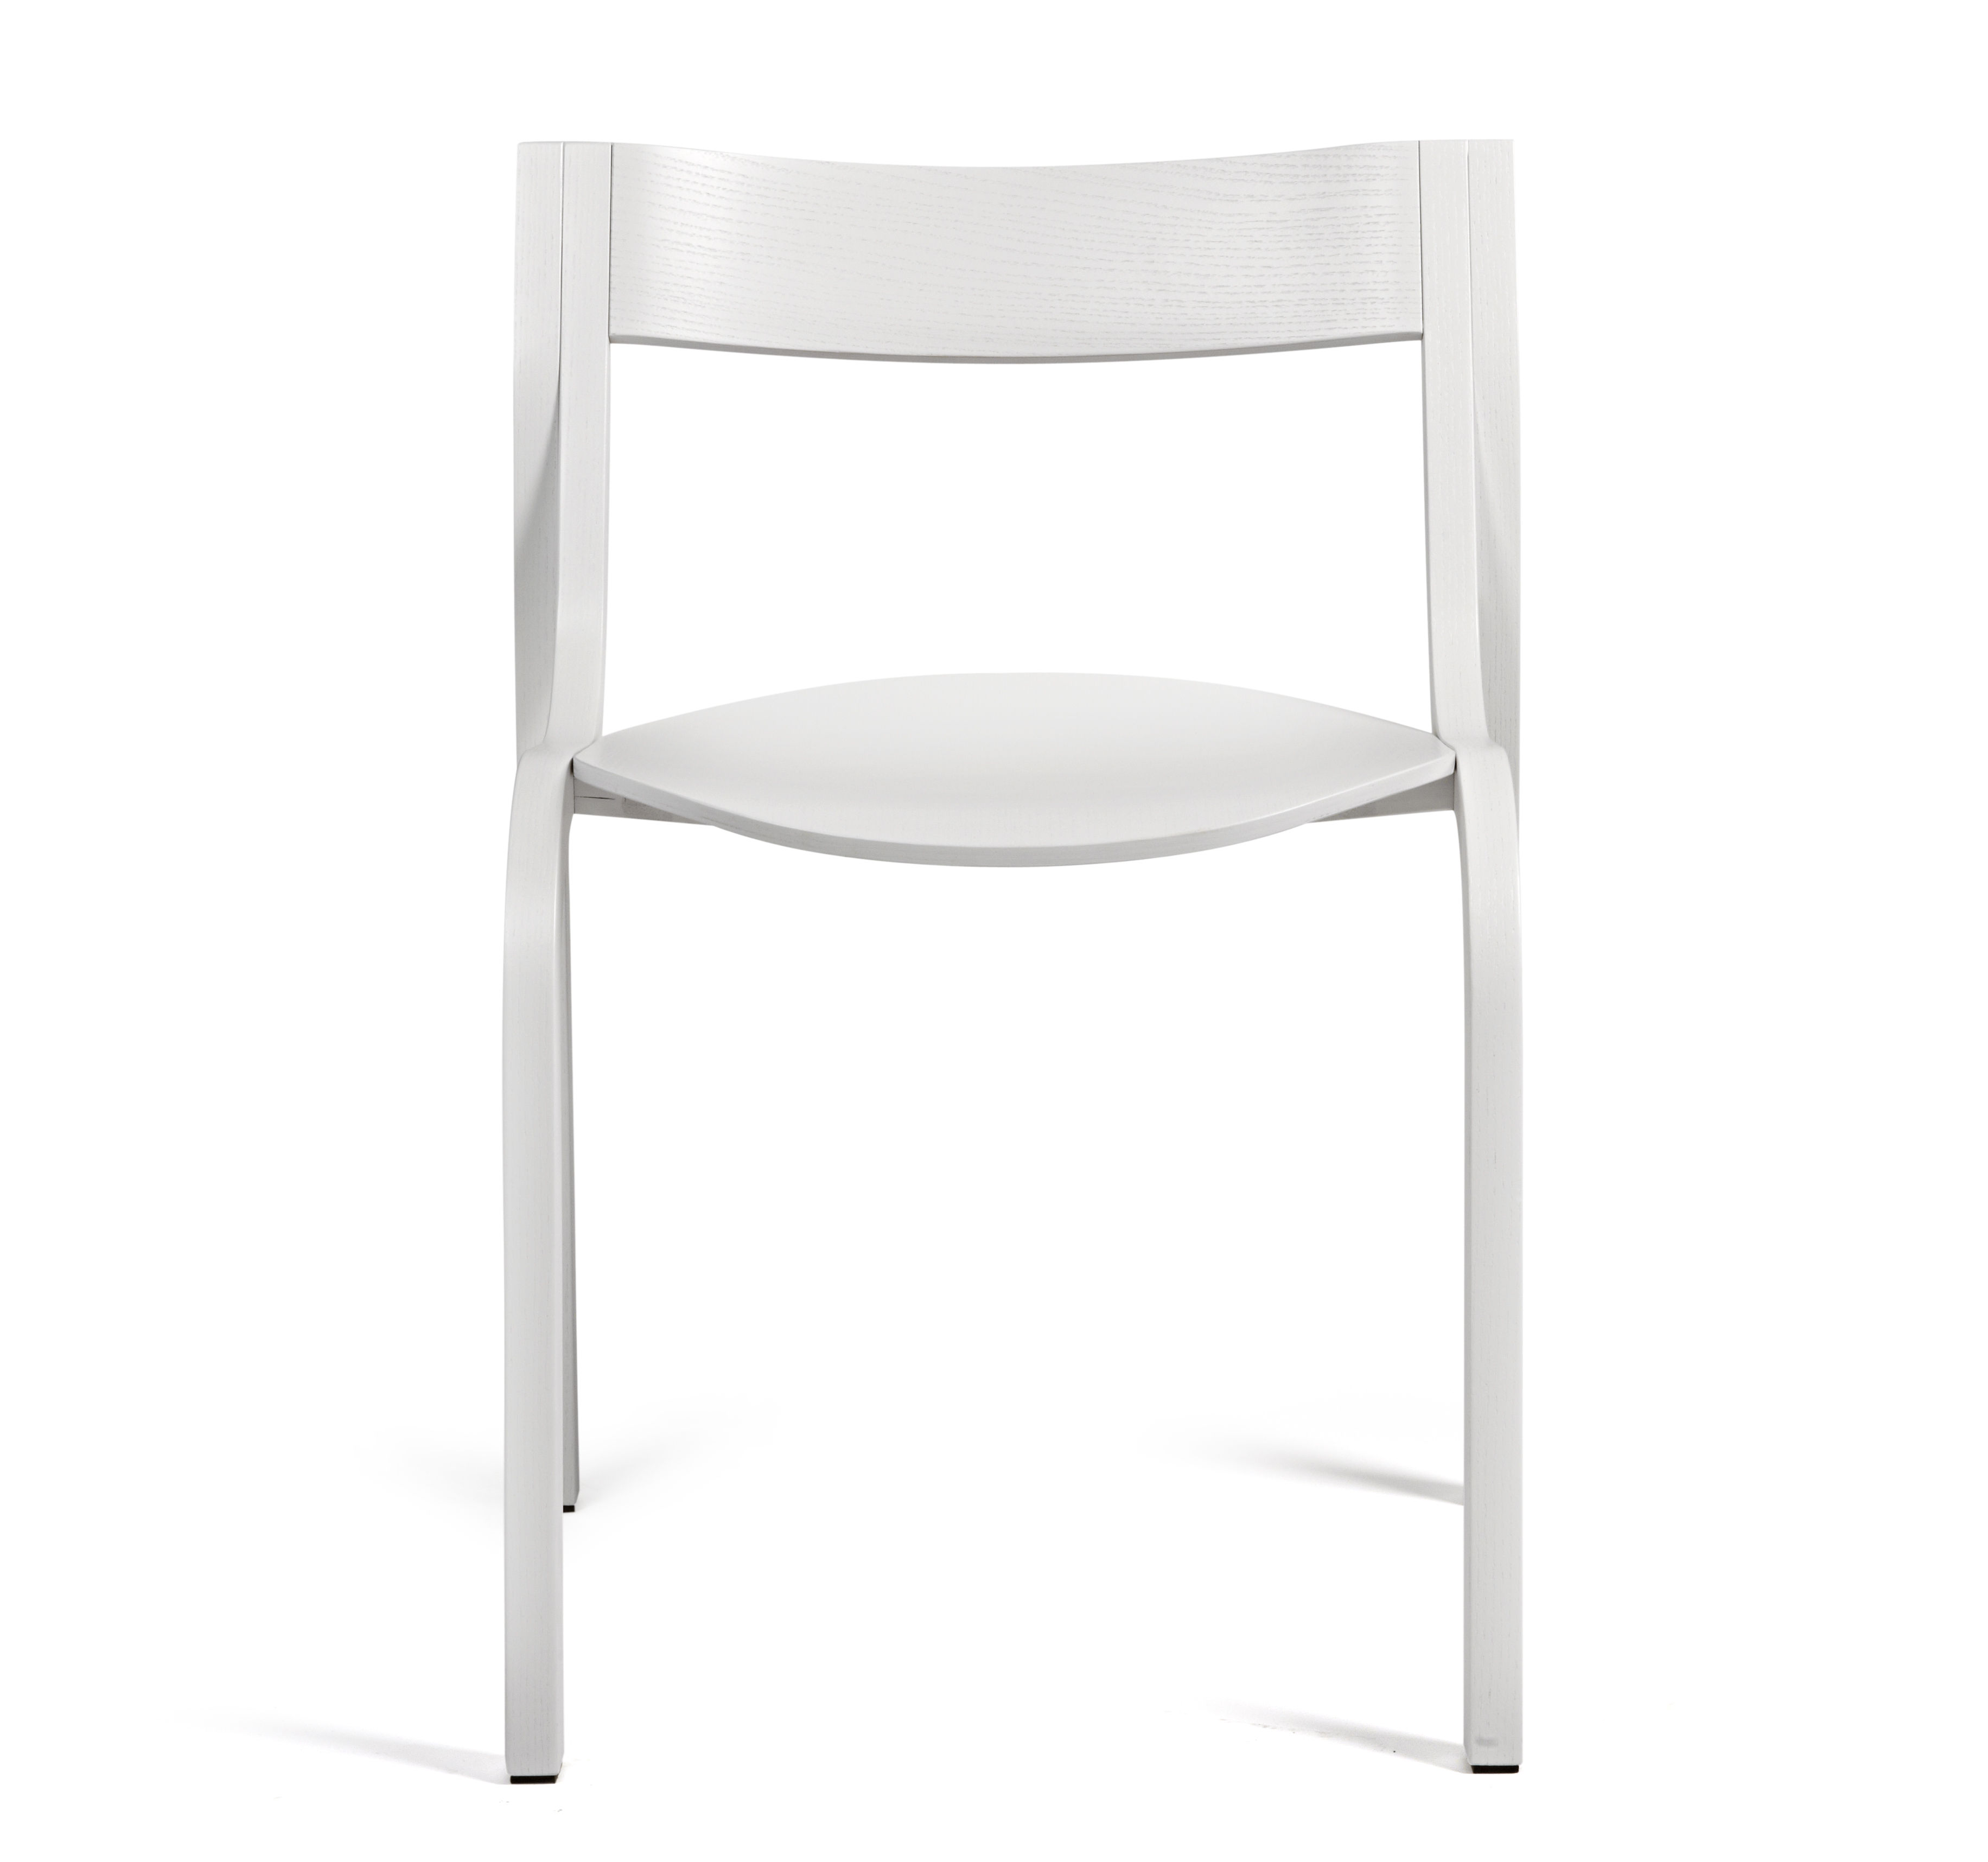 Chaise empilable konrad bois teint blanc lapalma - Bois teinte blanc ...